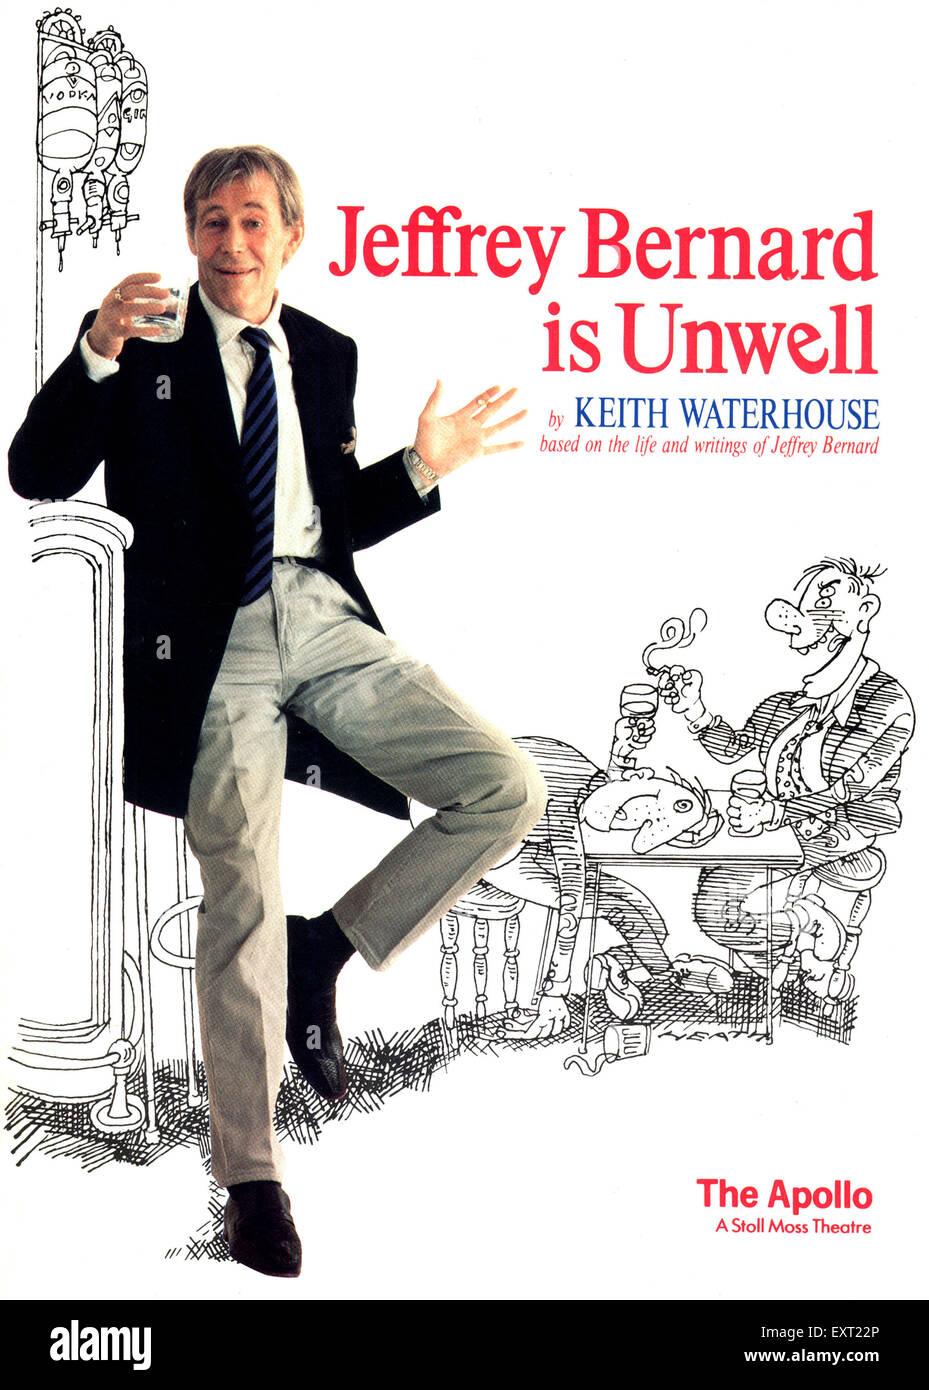 1980s UK Jeffrey Bernard is Unwell Poster - Stock Image